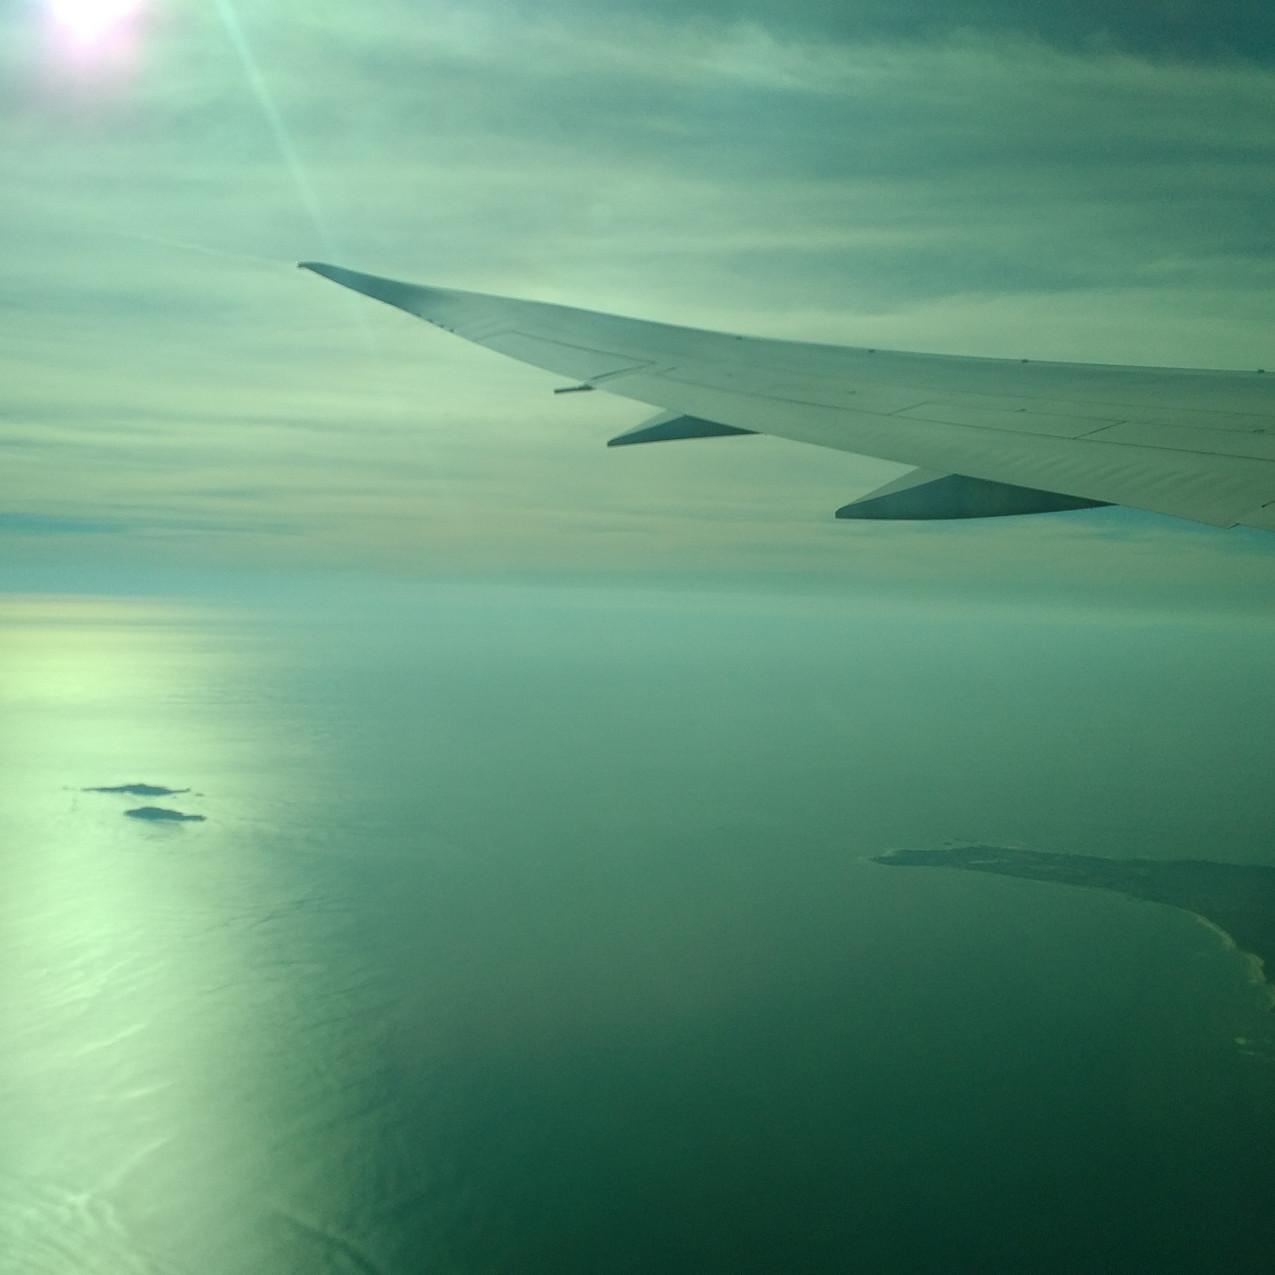 Boeing 787 Dreamliner window medium tint